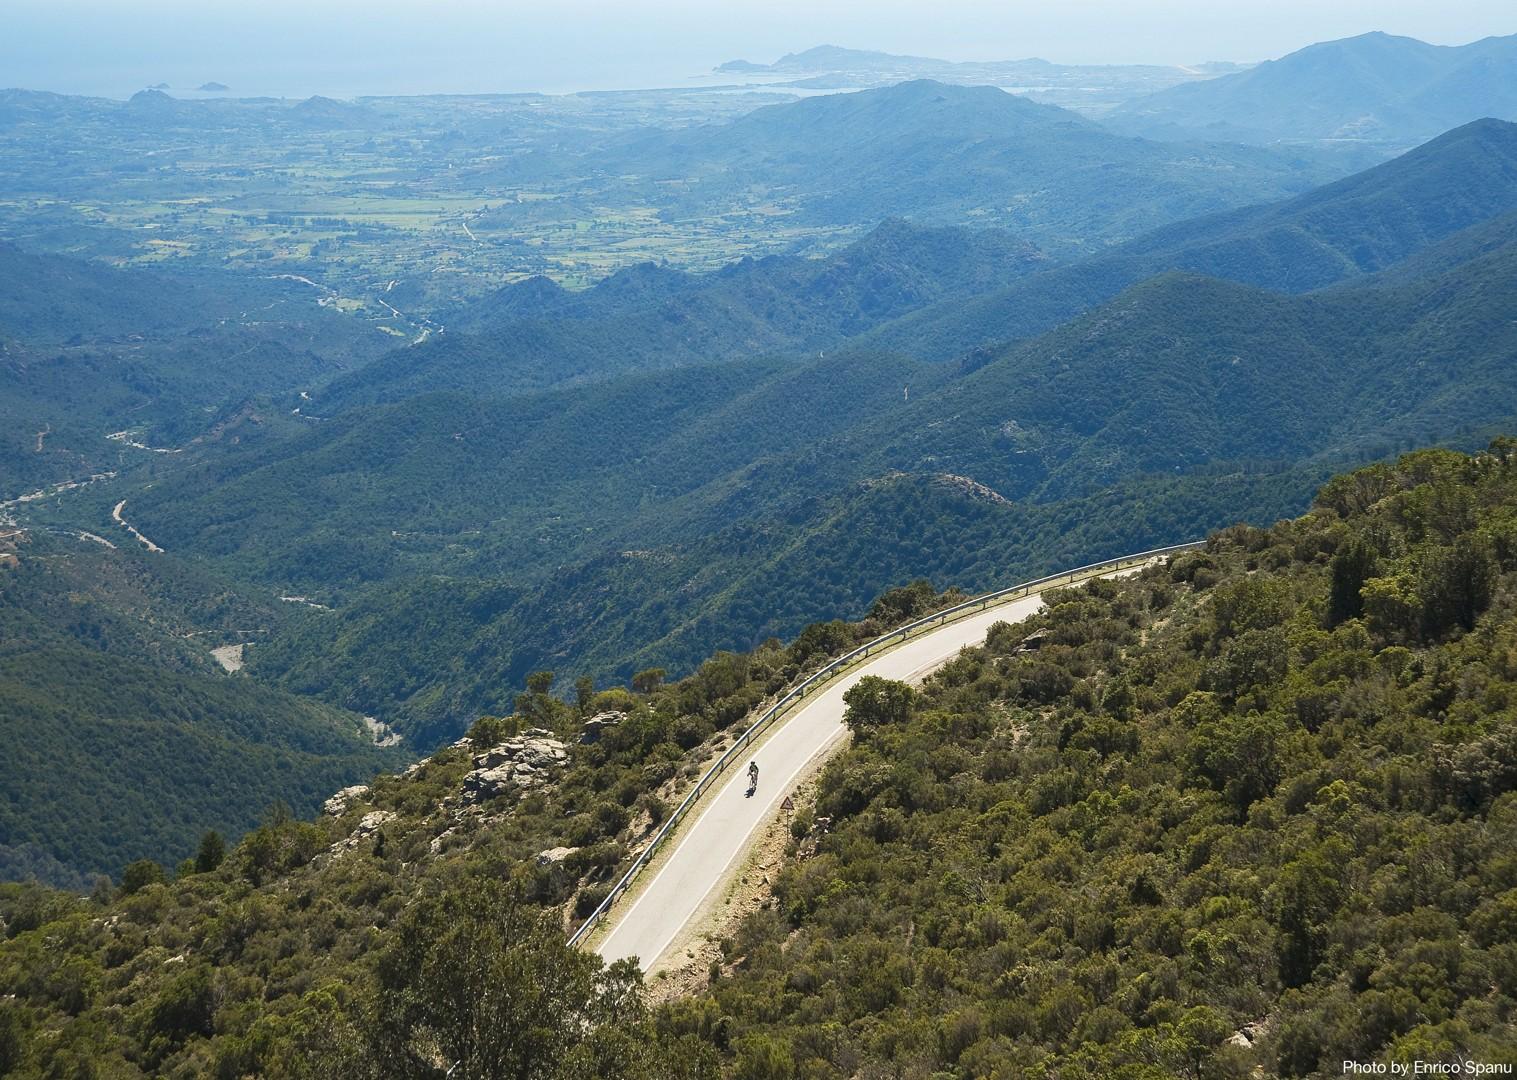 Road-Cycling-Holiday-Italy-Sardinia-Sardinian-Mountains-Mountain-roads.jpg - Italy - Sardinia - Mountain Explorer - Guided Road Cycling Holiday - Italia Road Cycling